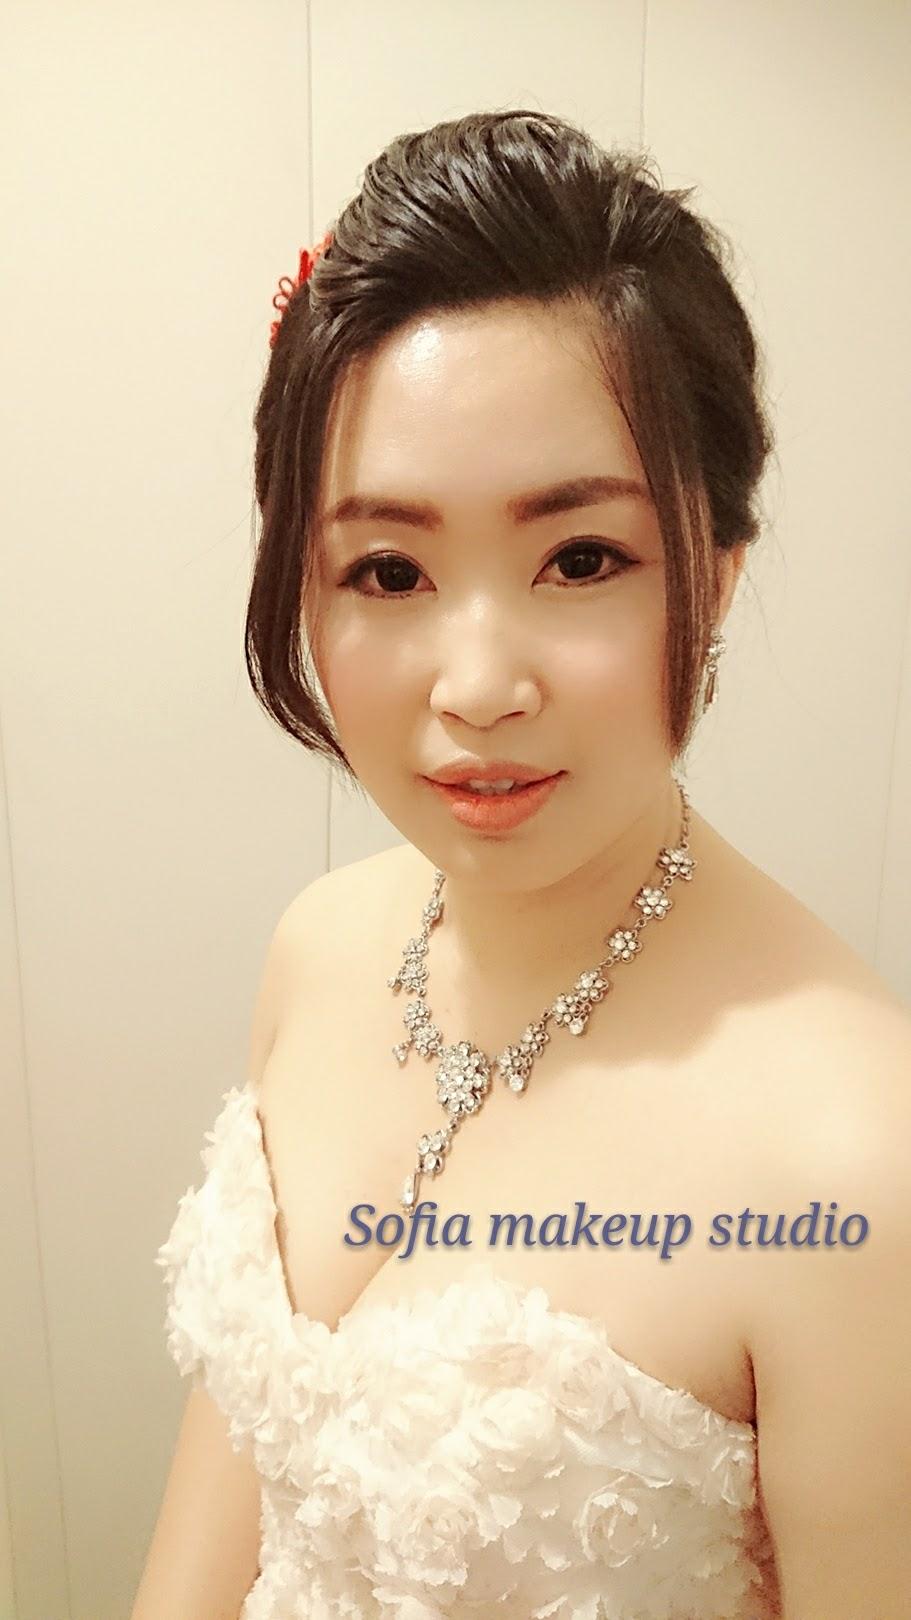 goMeihuaTemp_mh1511839921512 - Sofia makeup studio - 結婚吧